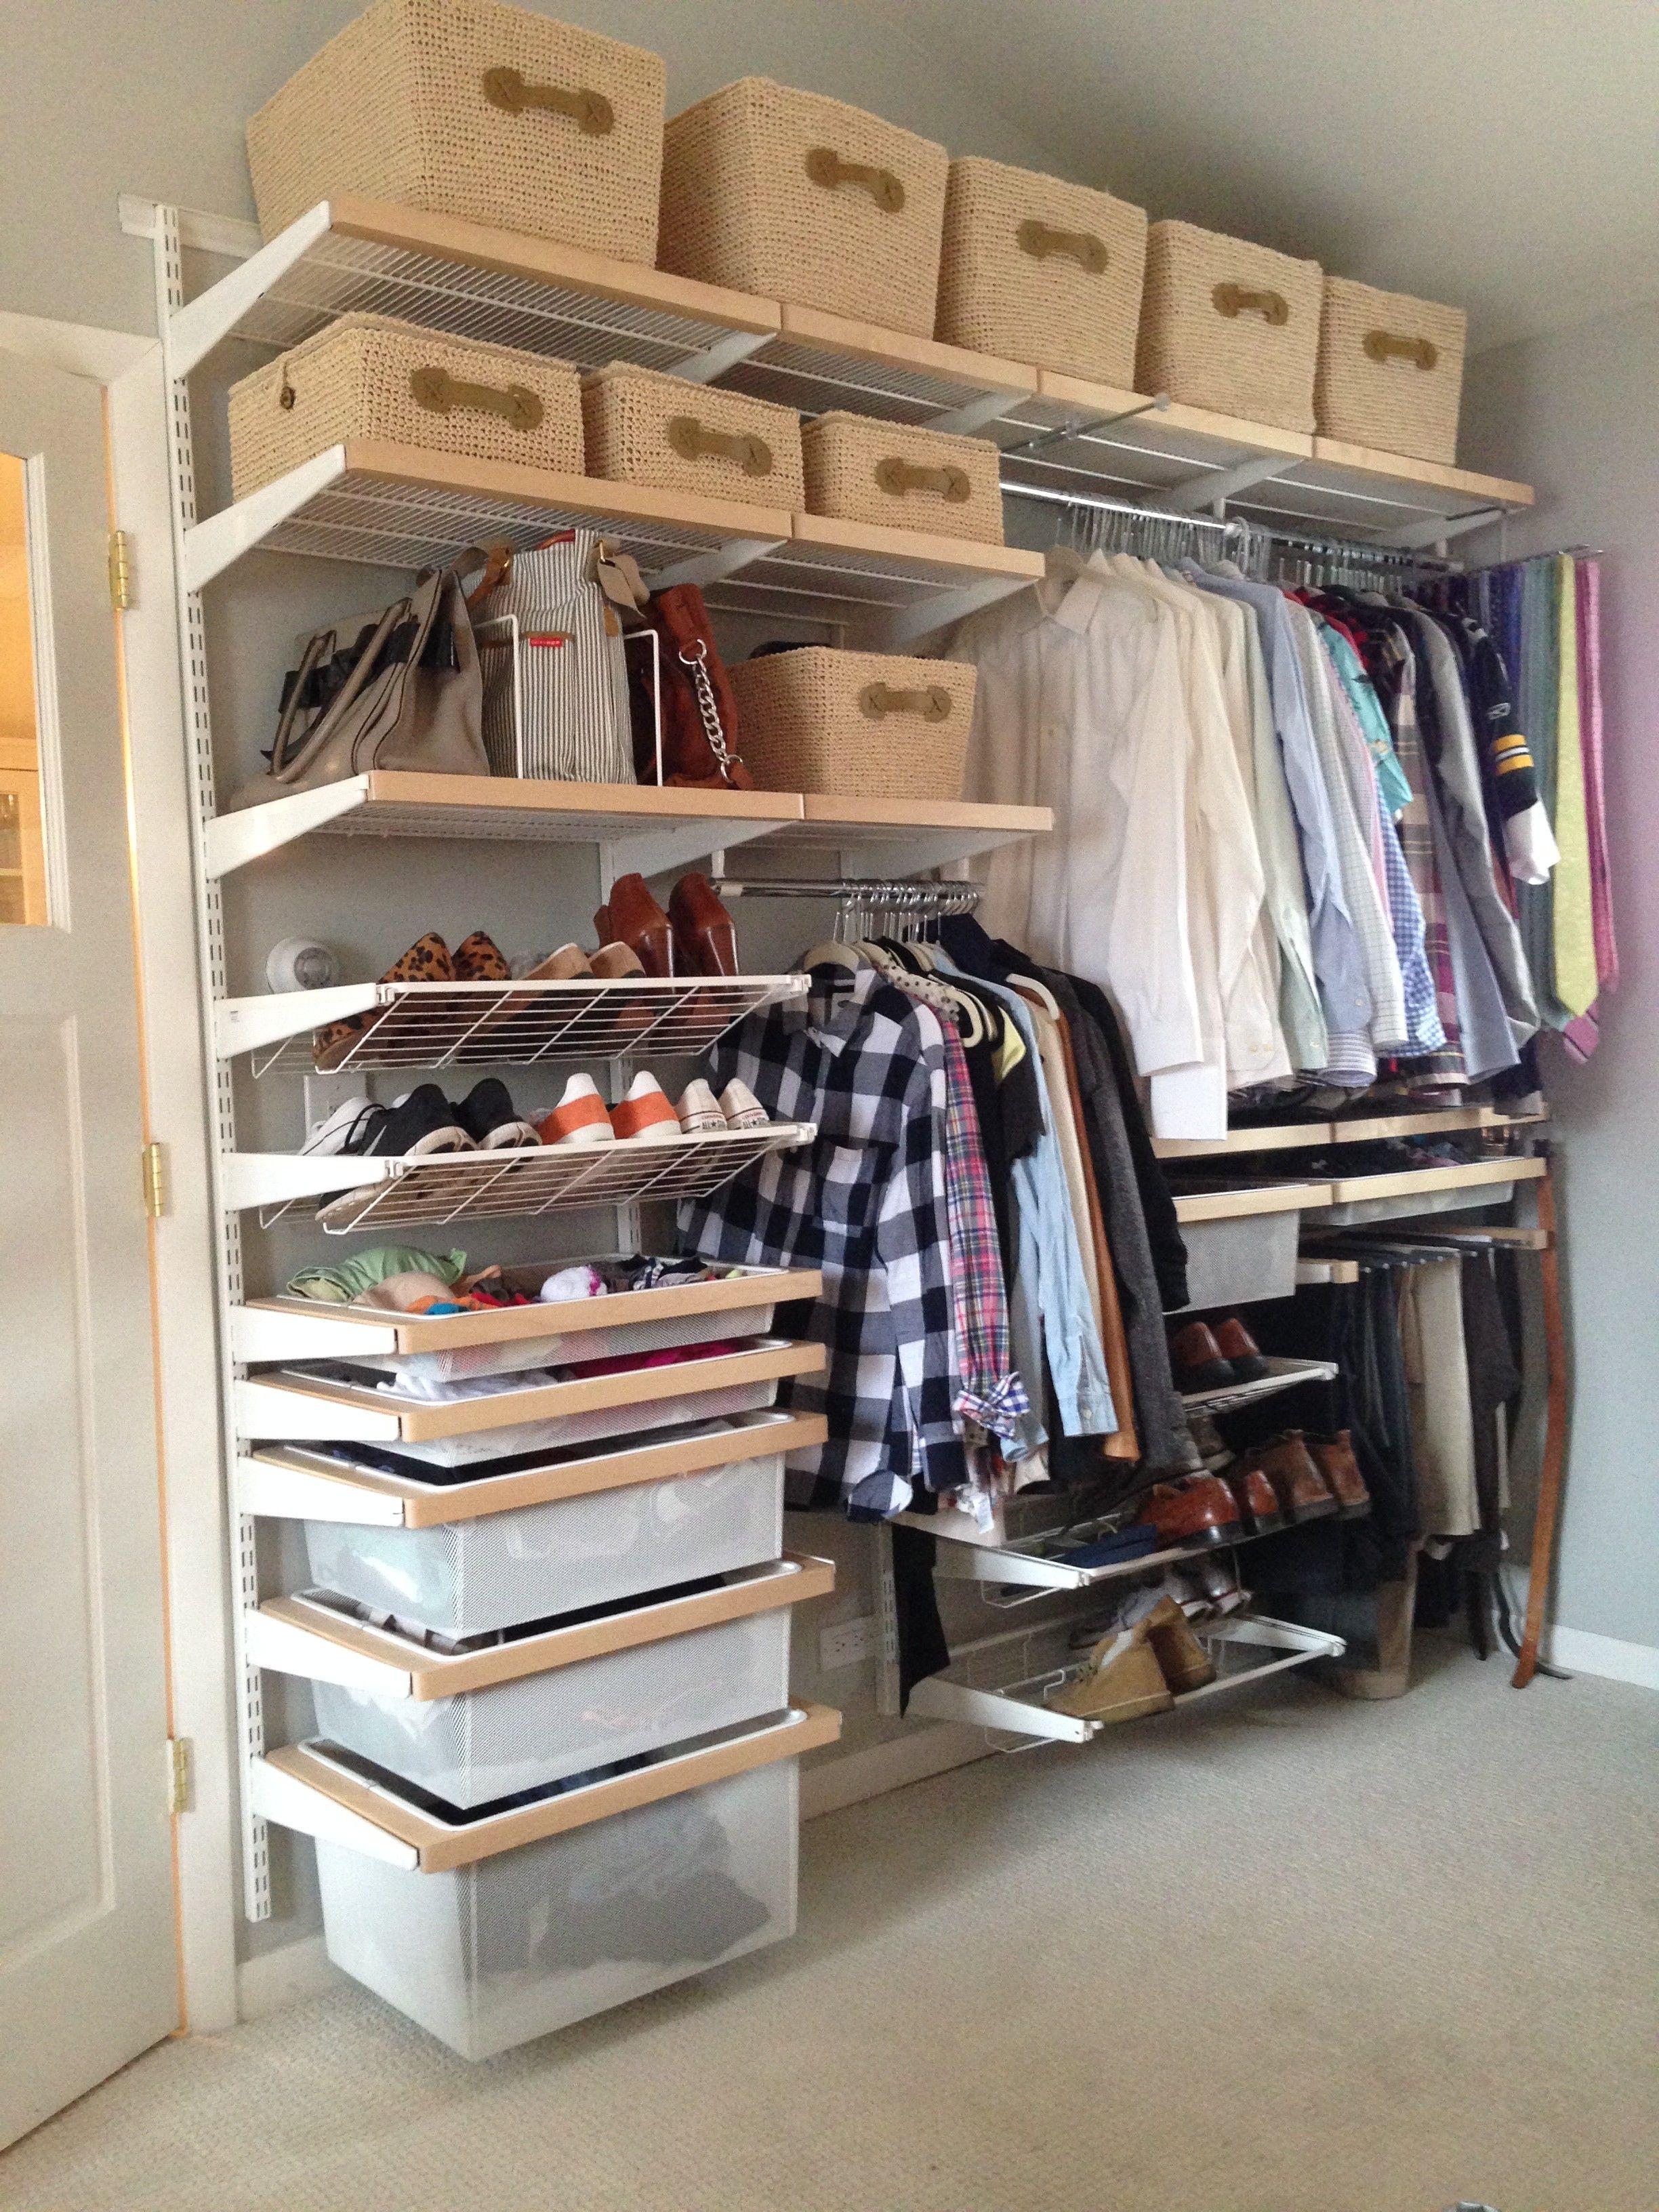 marvelous bedroom closet interior design | Elegant Interior Home Design Elfa Closet: Marvelous ...